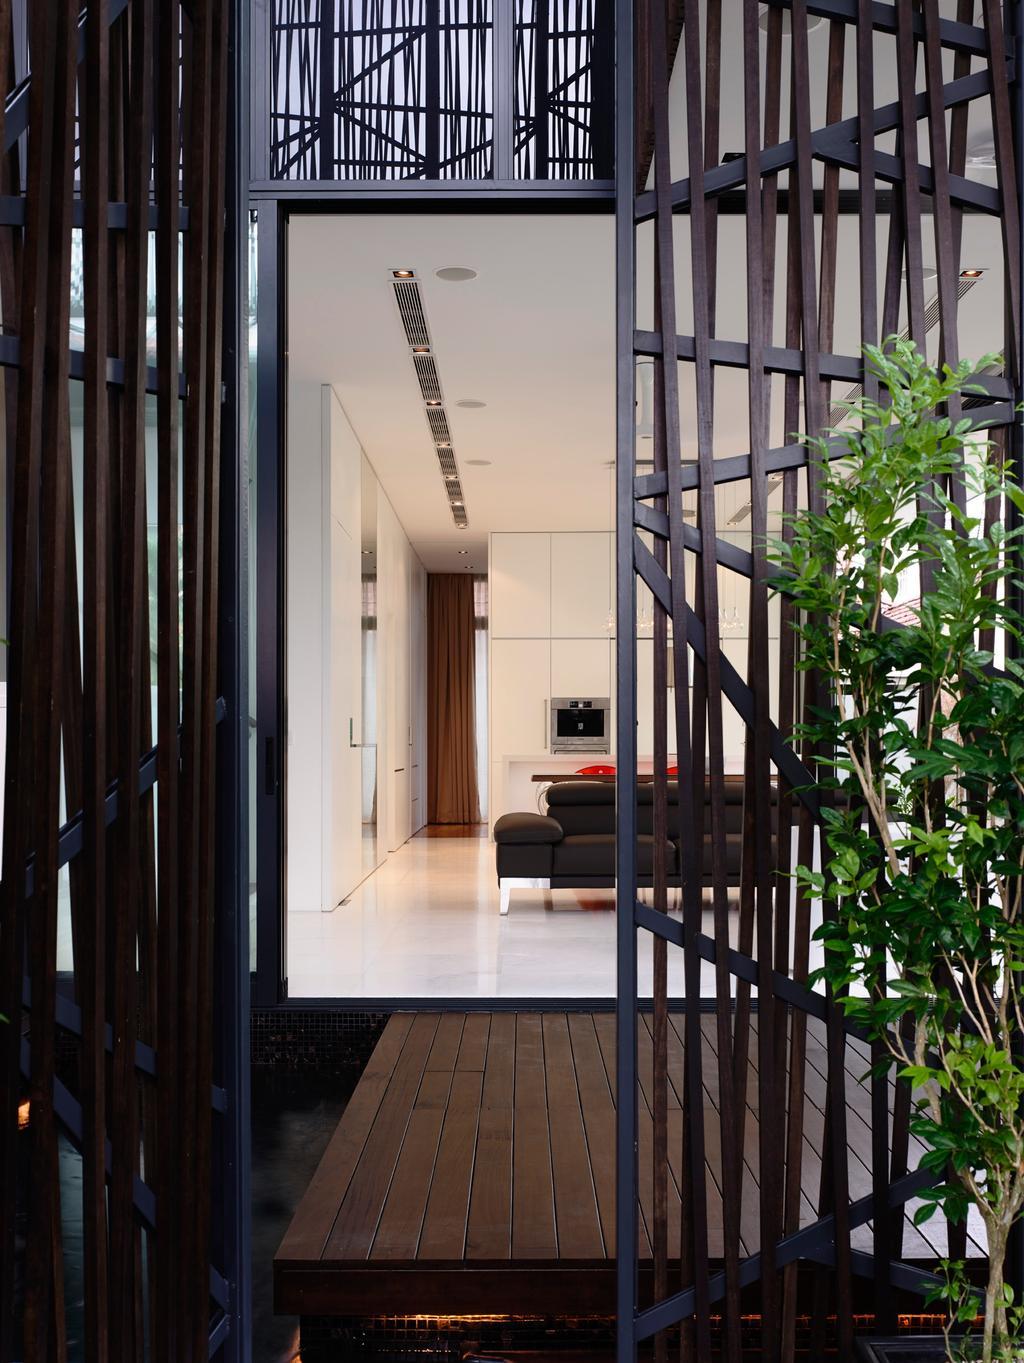 Contemporary, Landed, Bowmont Gardens, Architect, HYLA Architects, Door, Folding Door, Flora, Plant, Vine, Prison, Corridor